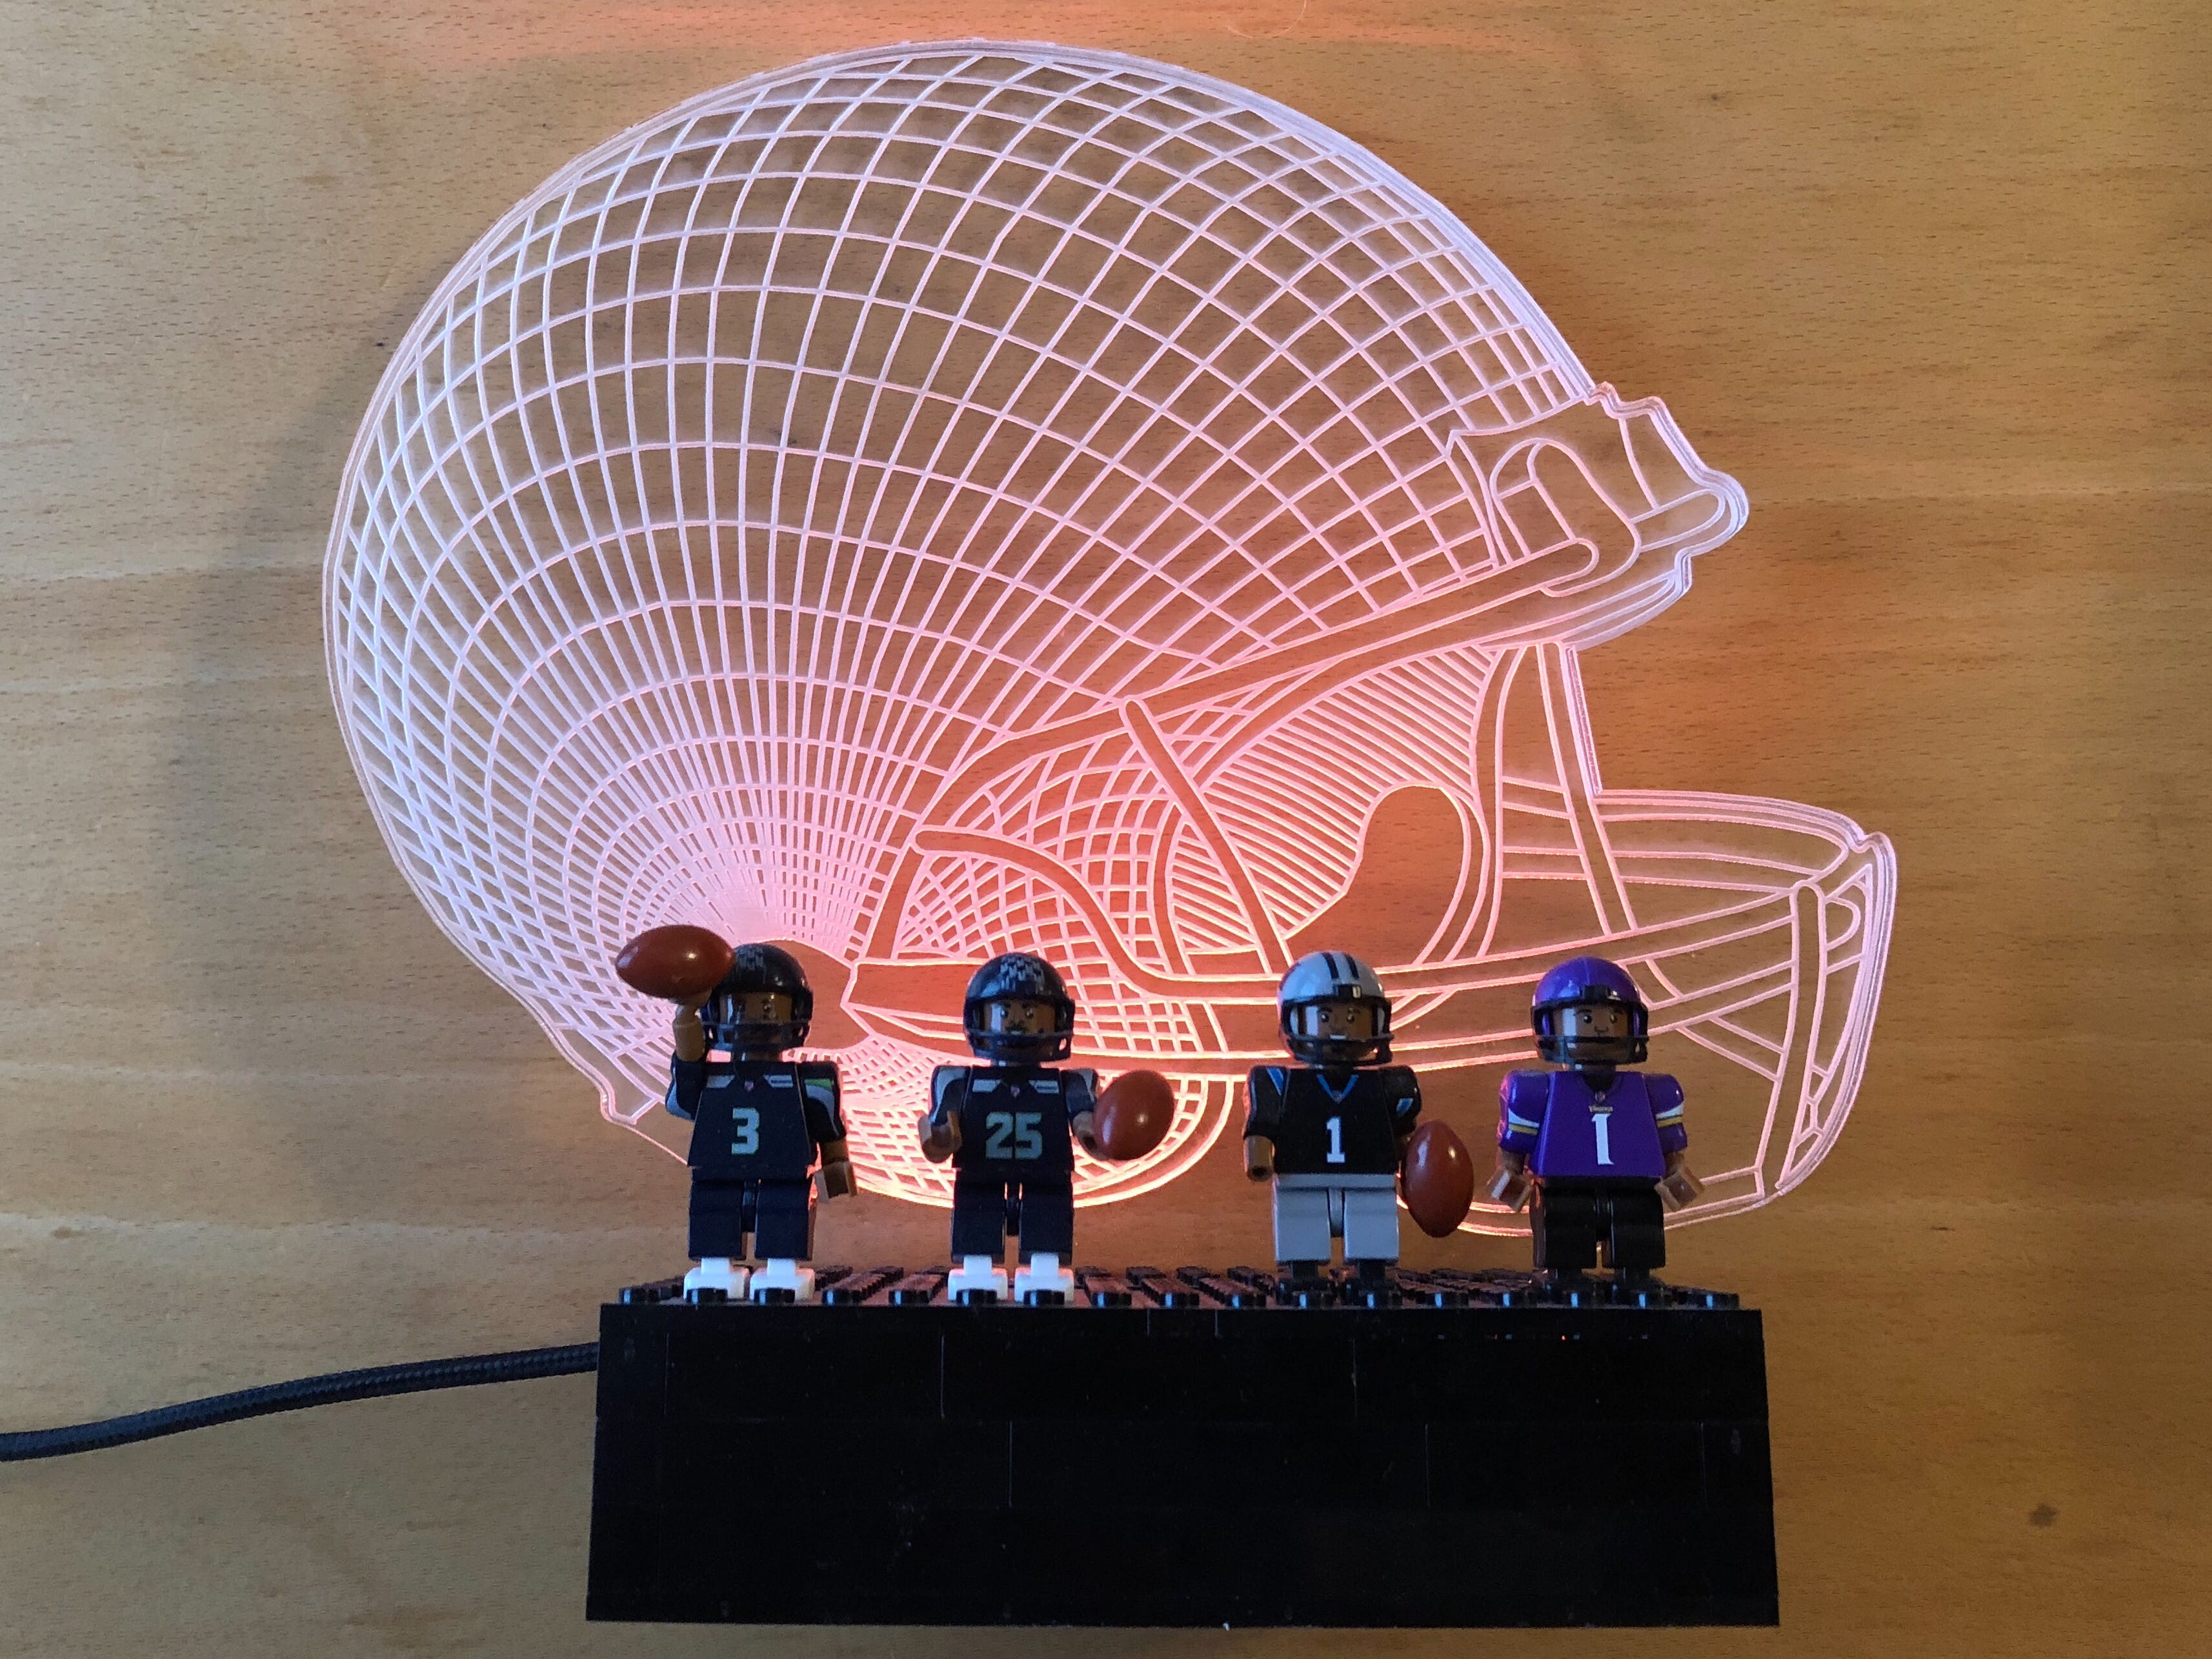 NFL Indicator